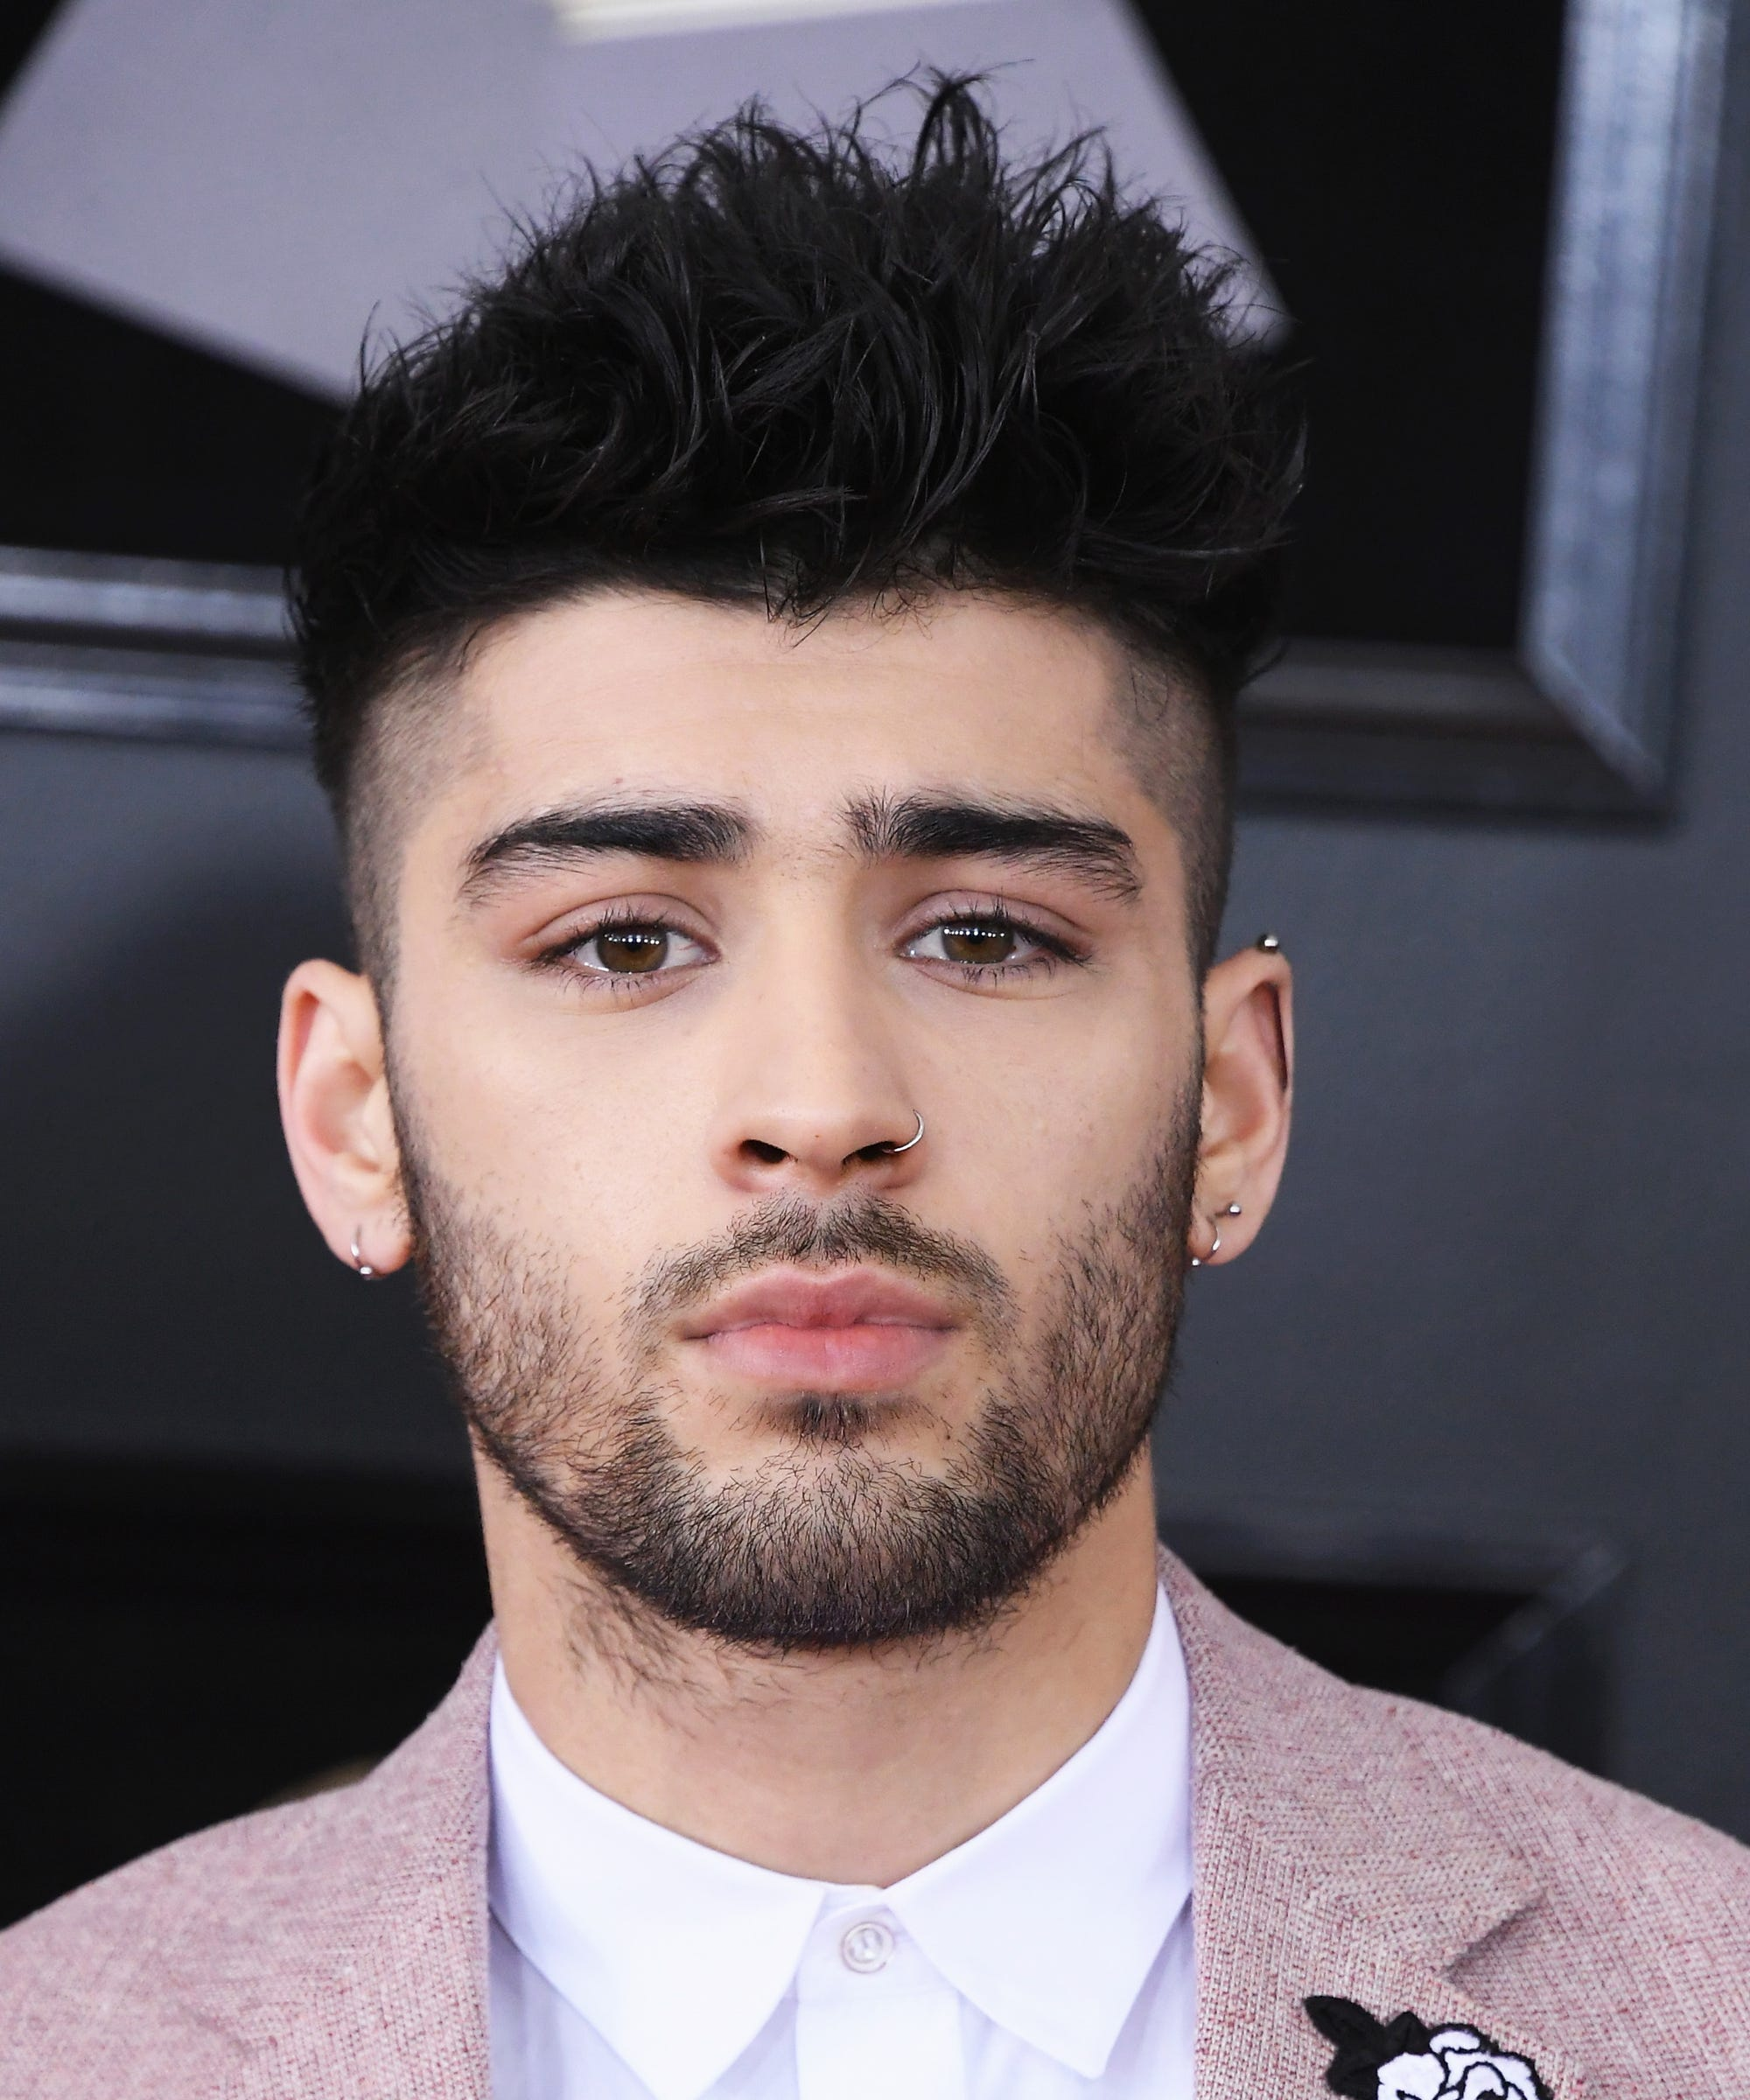 Zayn Malik Hair Styles: Cool Men Short Haircut Ideas images